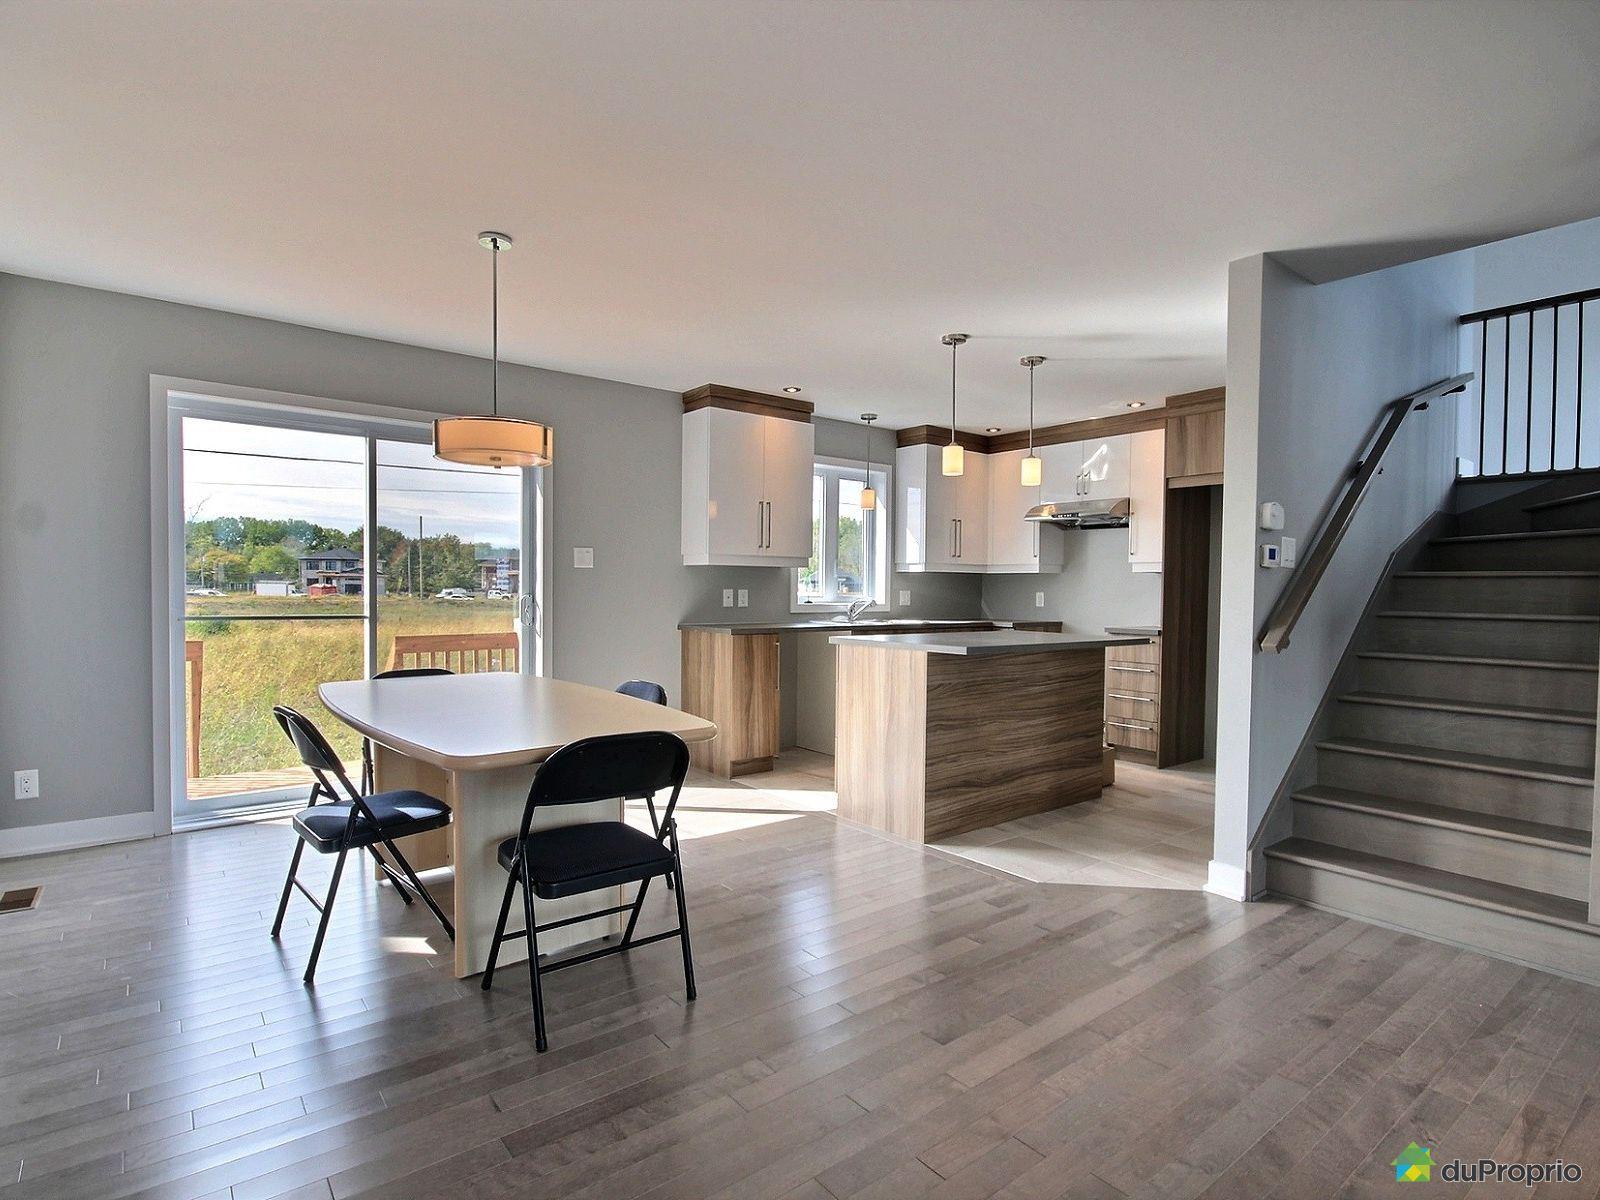 maison neuve vendre chambly 1645 bernadette laflamme immobilier qu bec duproprio 720139. Black Bedroom Furniture Sets. Home Design Ideas